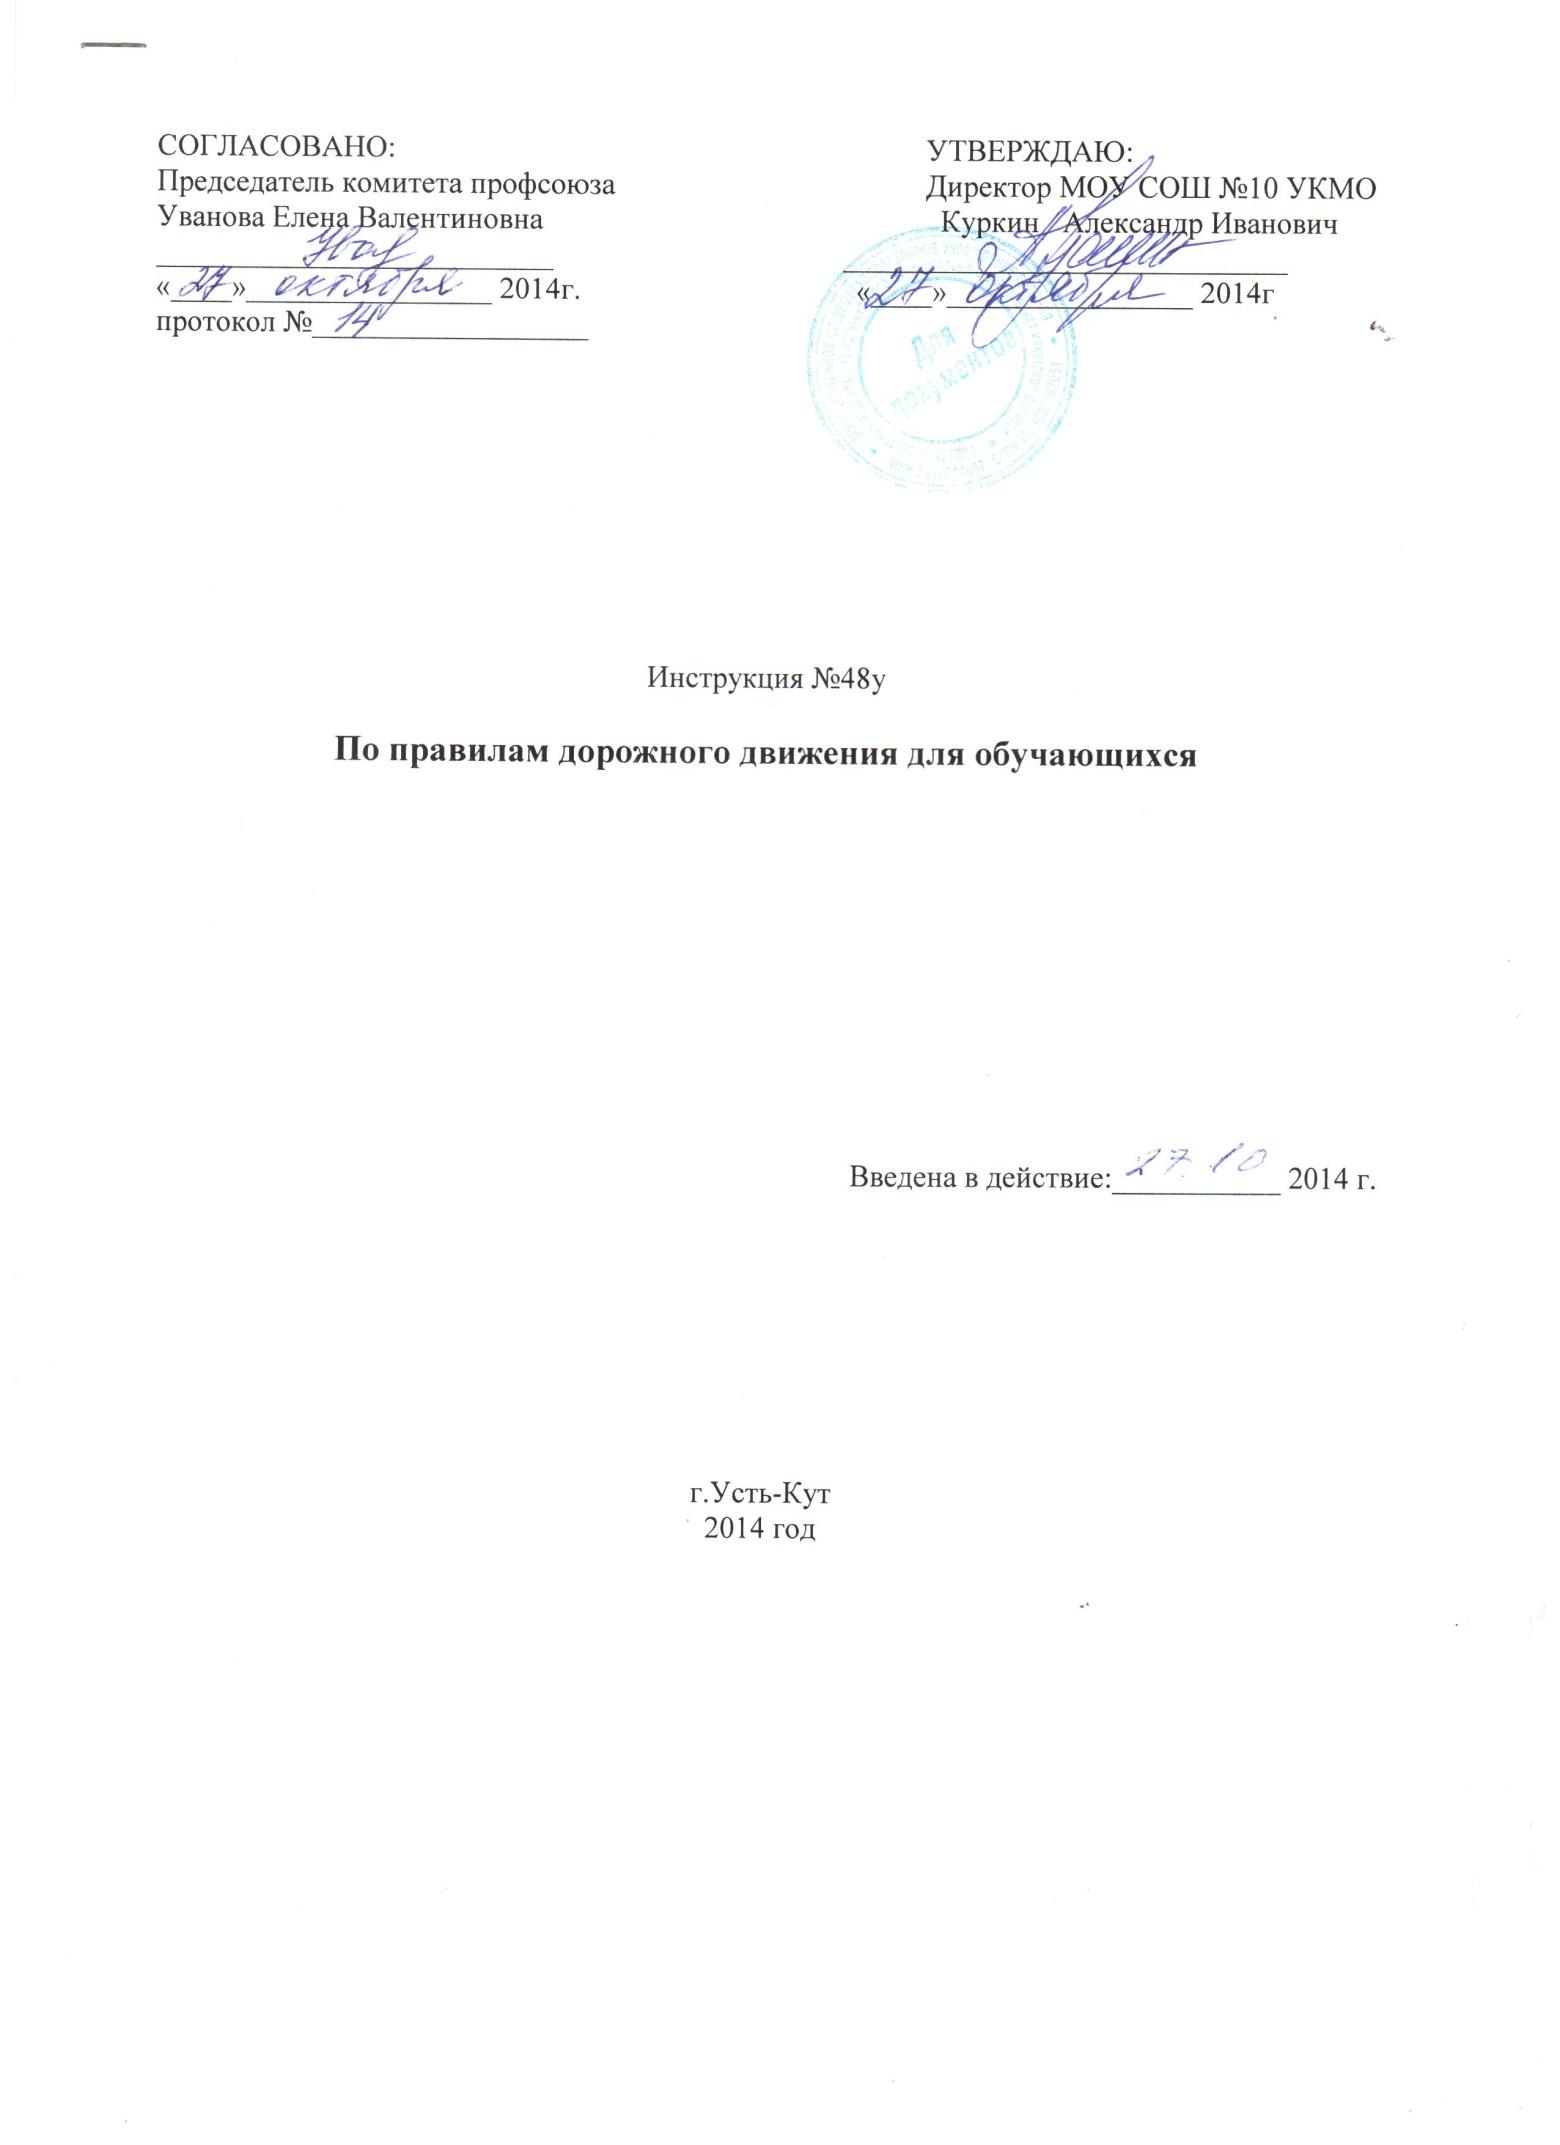 C:\Users\Admin\Documents\Scanned Documents\Рисунок (25).jpg